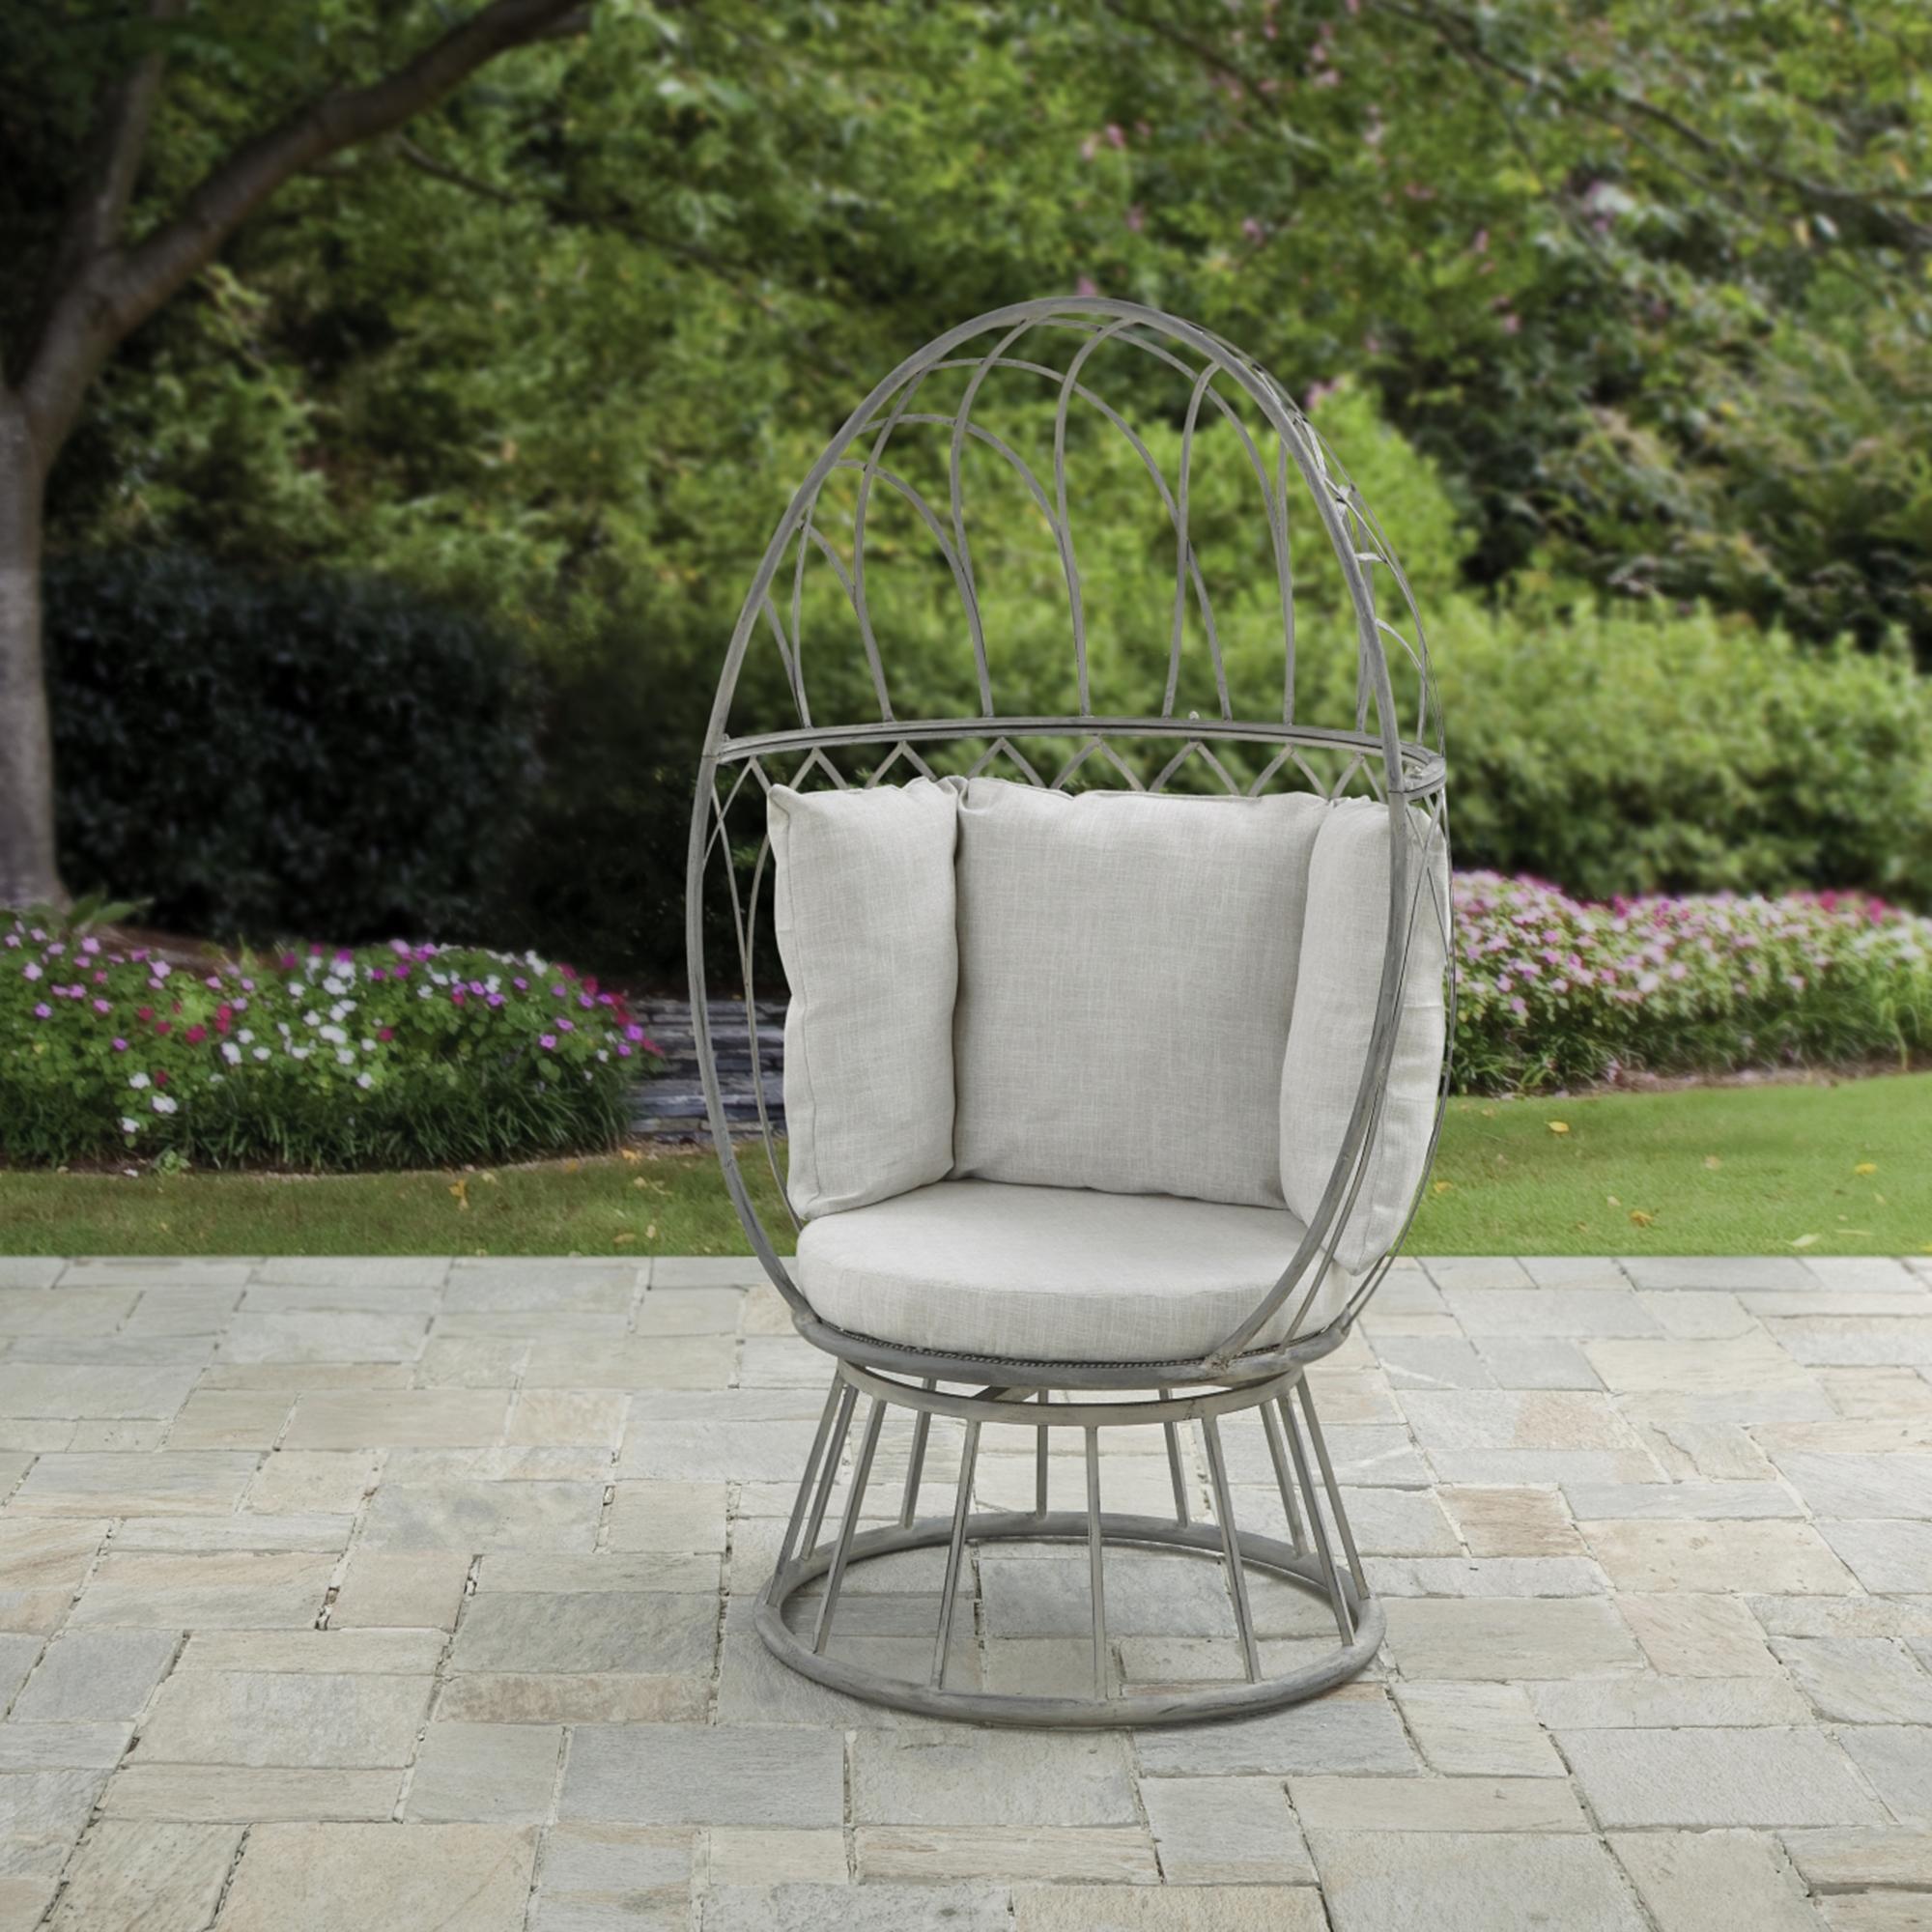 garden chairs florence grey swivel chair CJXFPMU